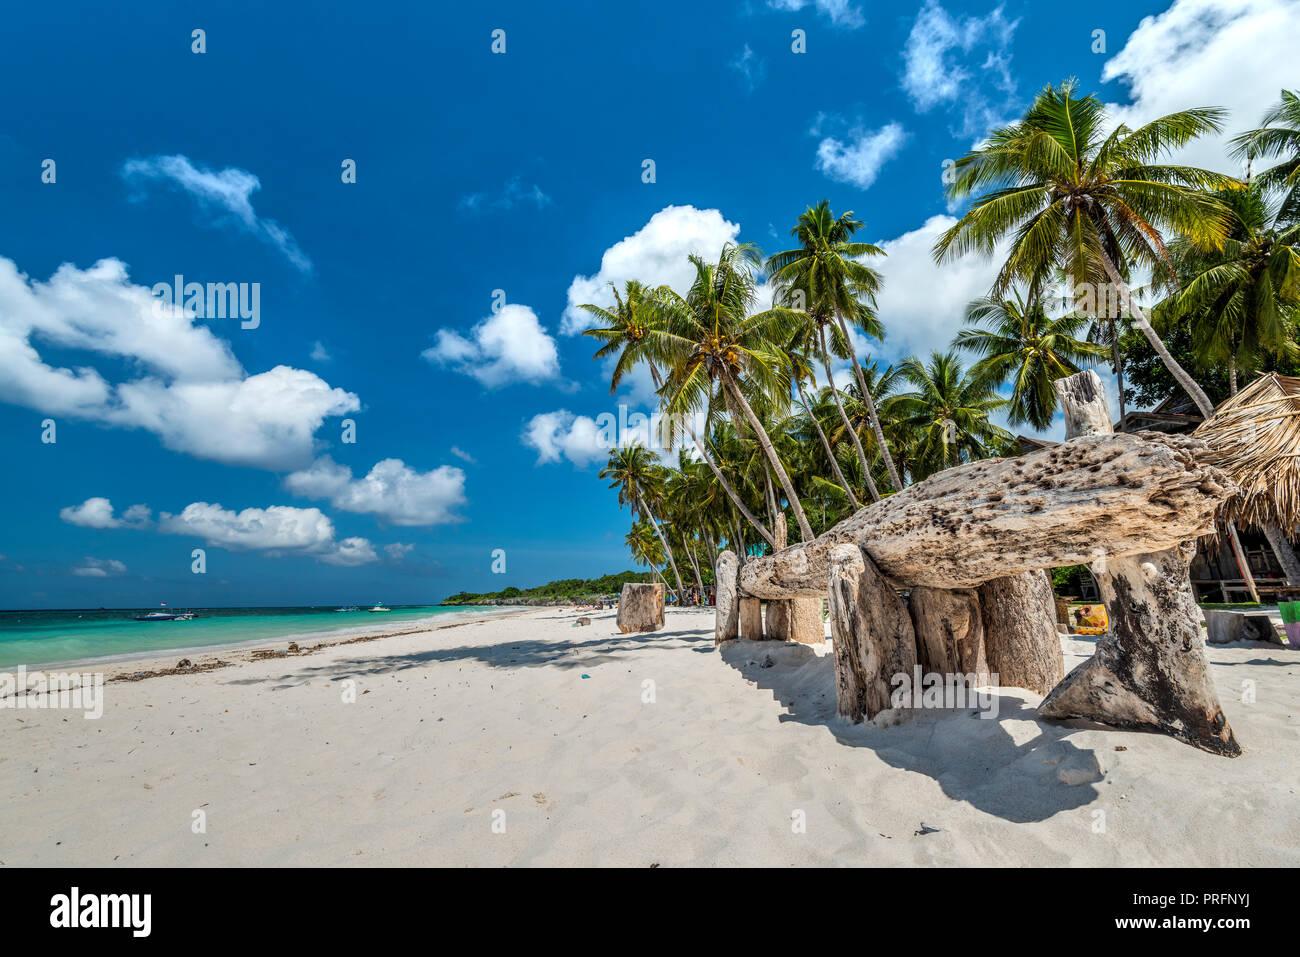 Pantai Bara beach, Bira, Sulawesi, Indonesia - Stock Image